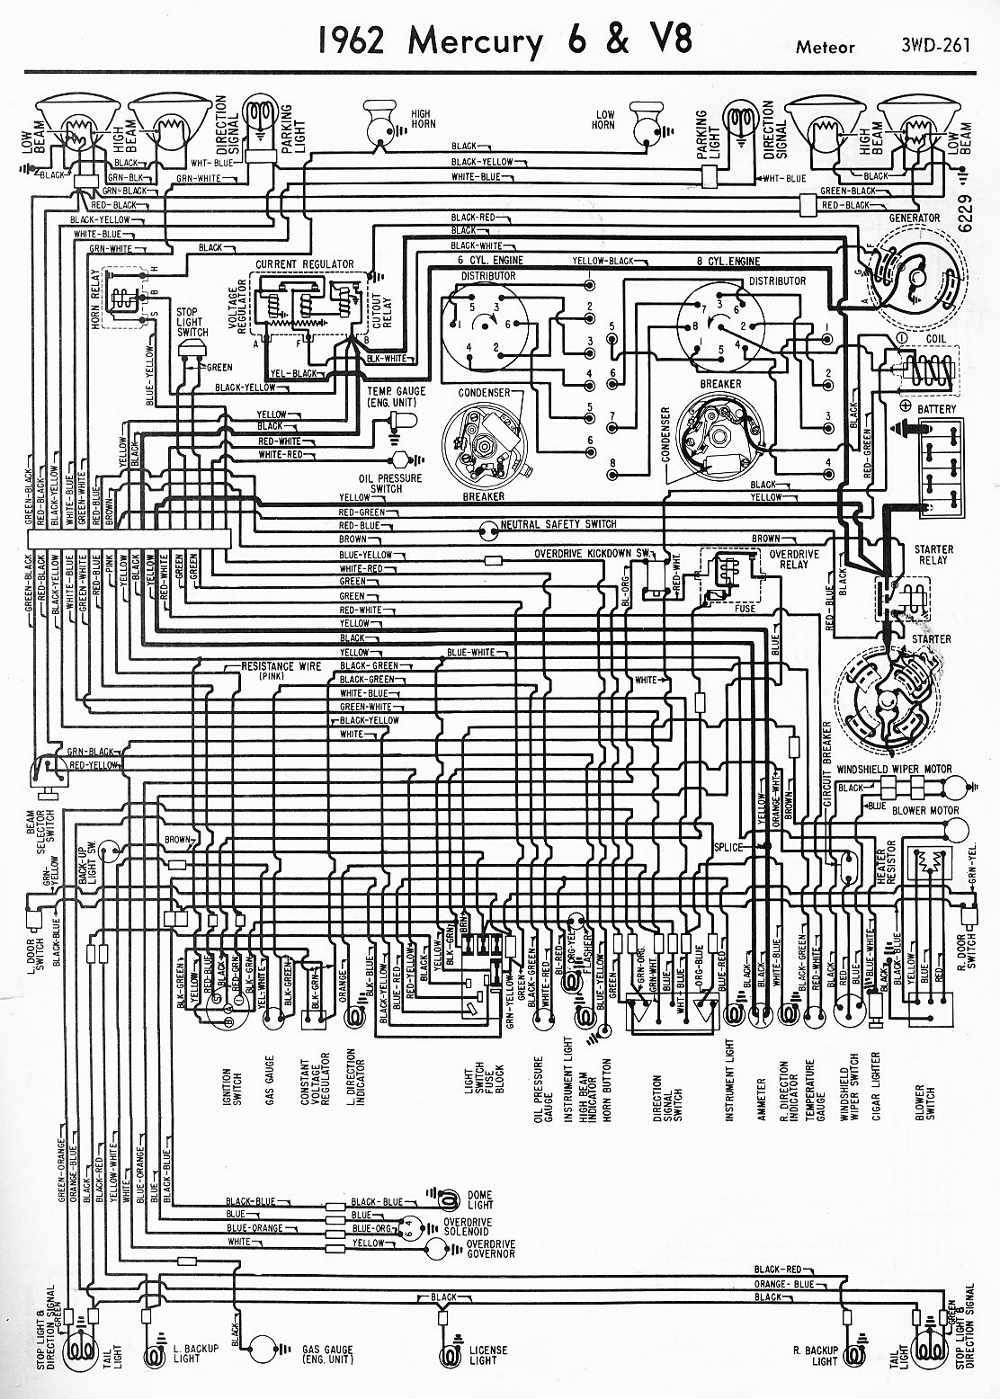 1969 mercury cyclone wiring diagram wiring diagram1969 mercury cyclone wiring diagram best part of wiring diagram1971 [ 1000 x 1399 Pixel ]